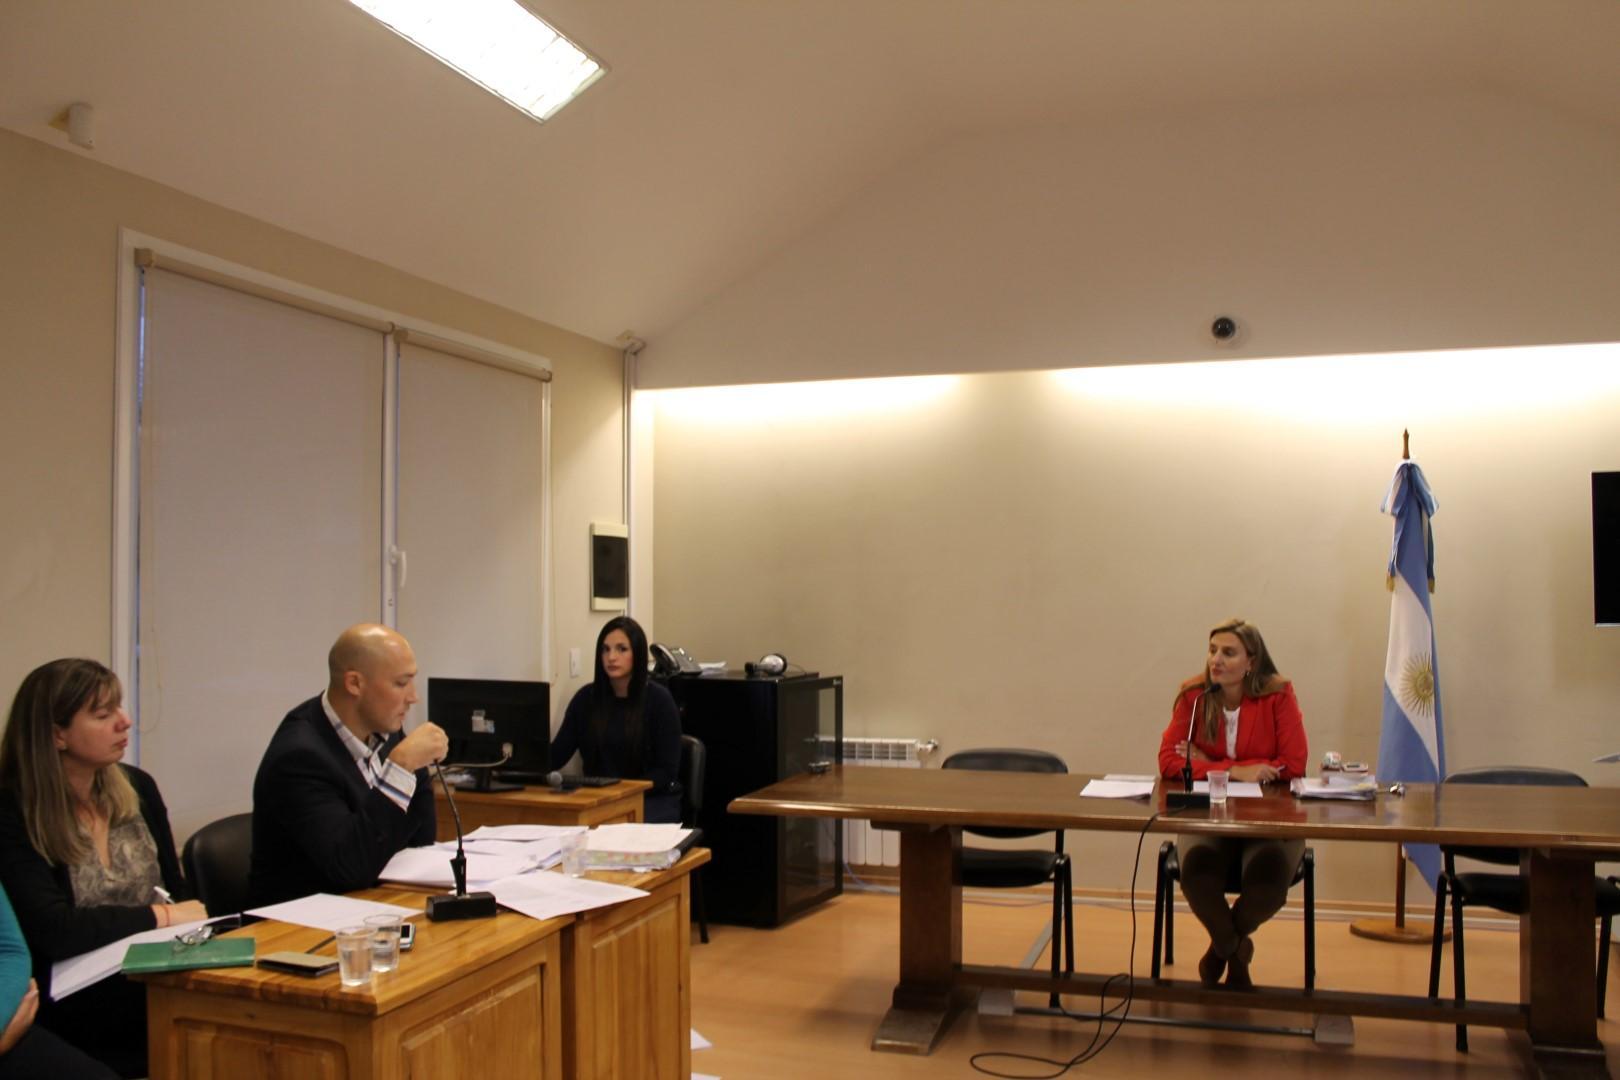 audiencia-jueza-martini-21-5-19-jpg-i-large